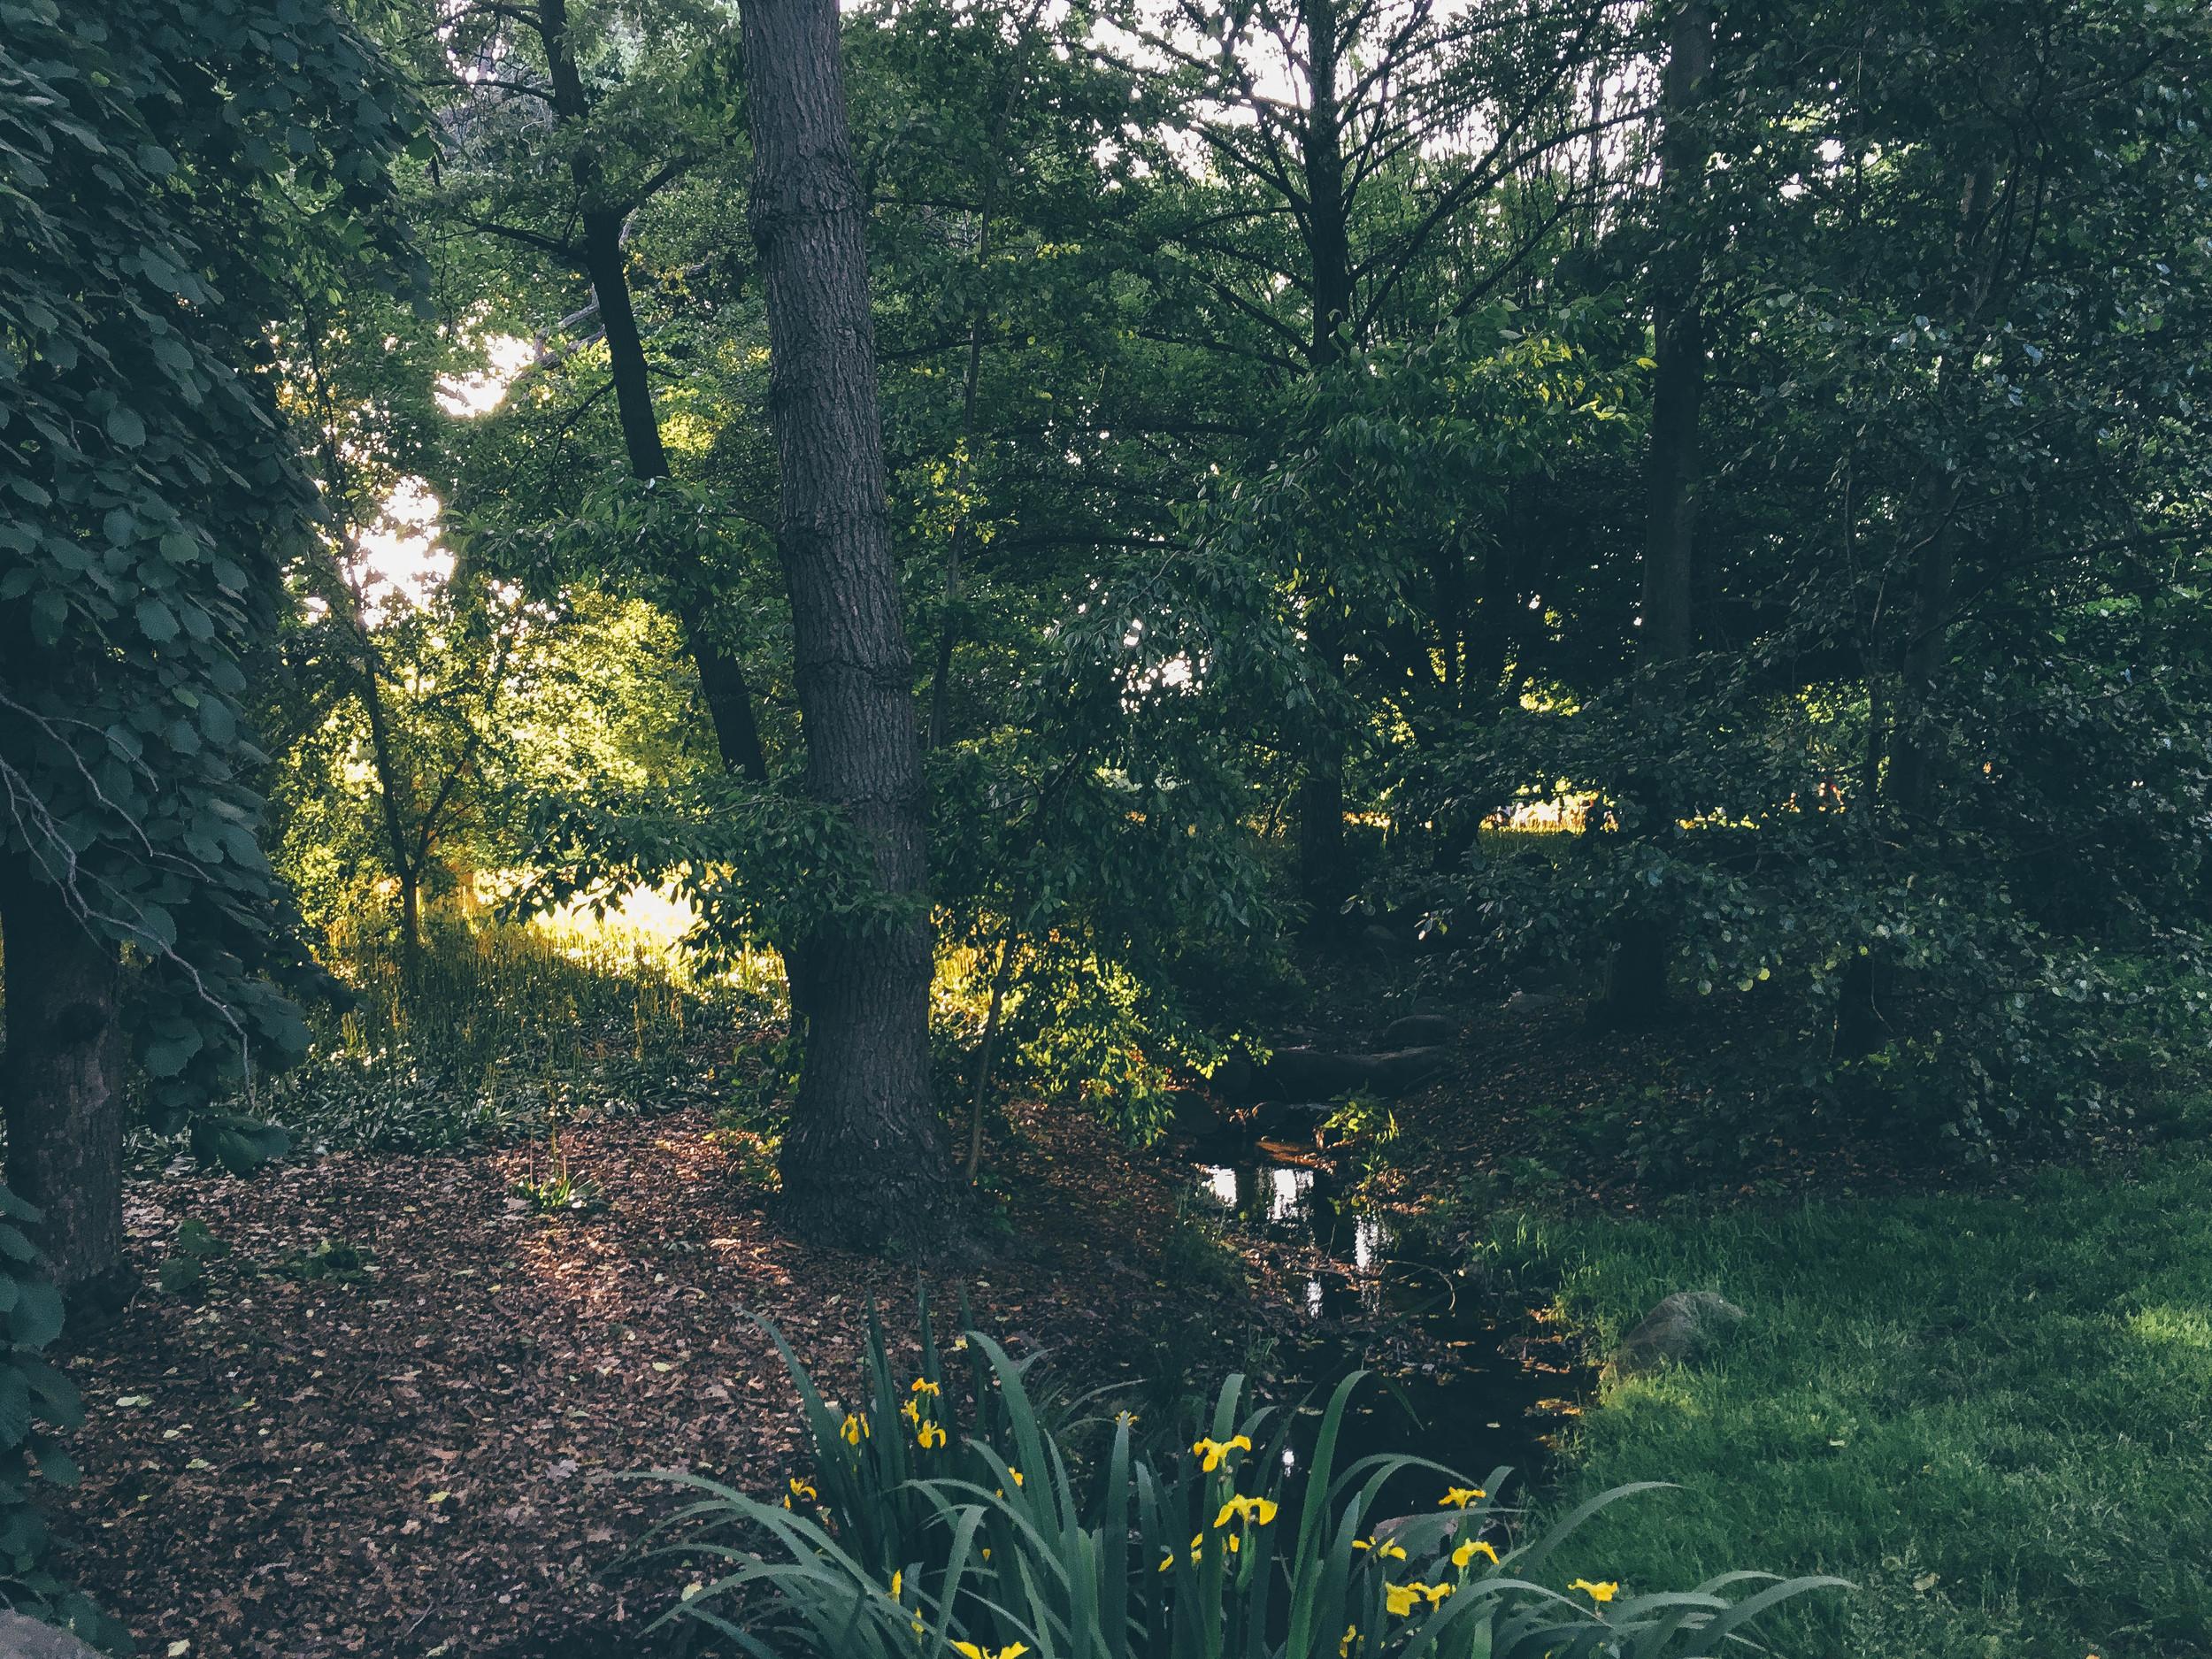 GardenCreek.jpg